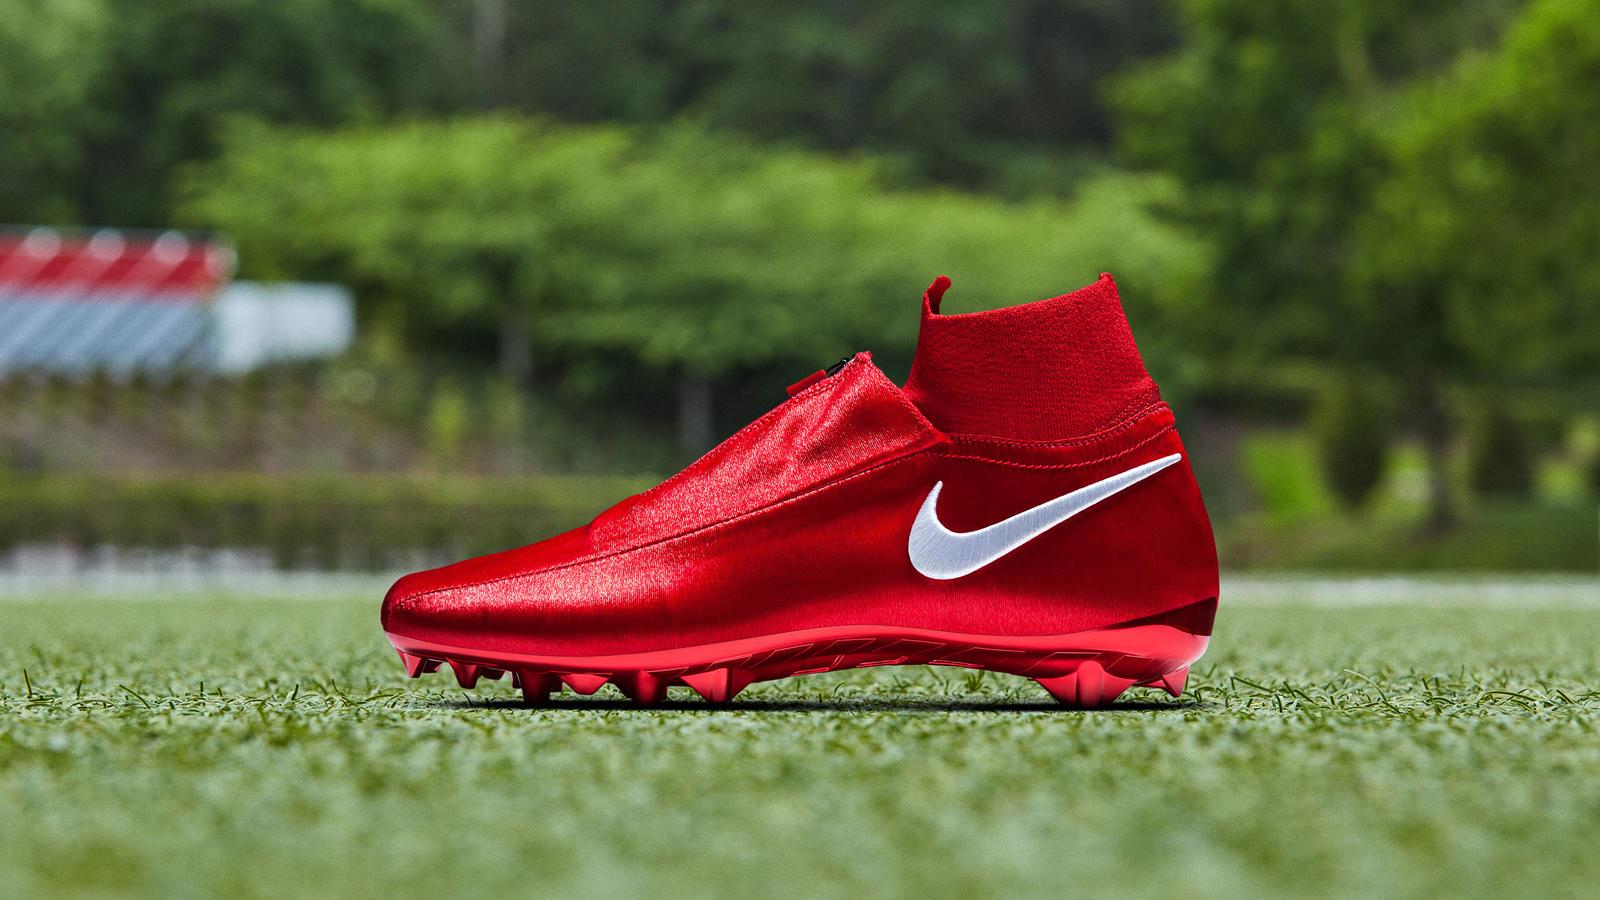 Nike Track Cleat (Odell Beckham Jr